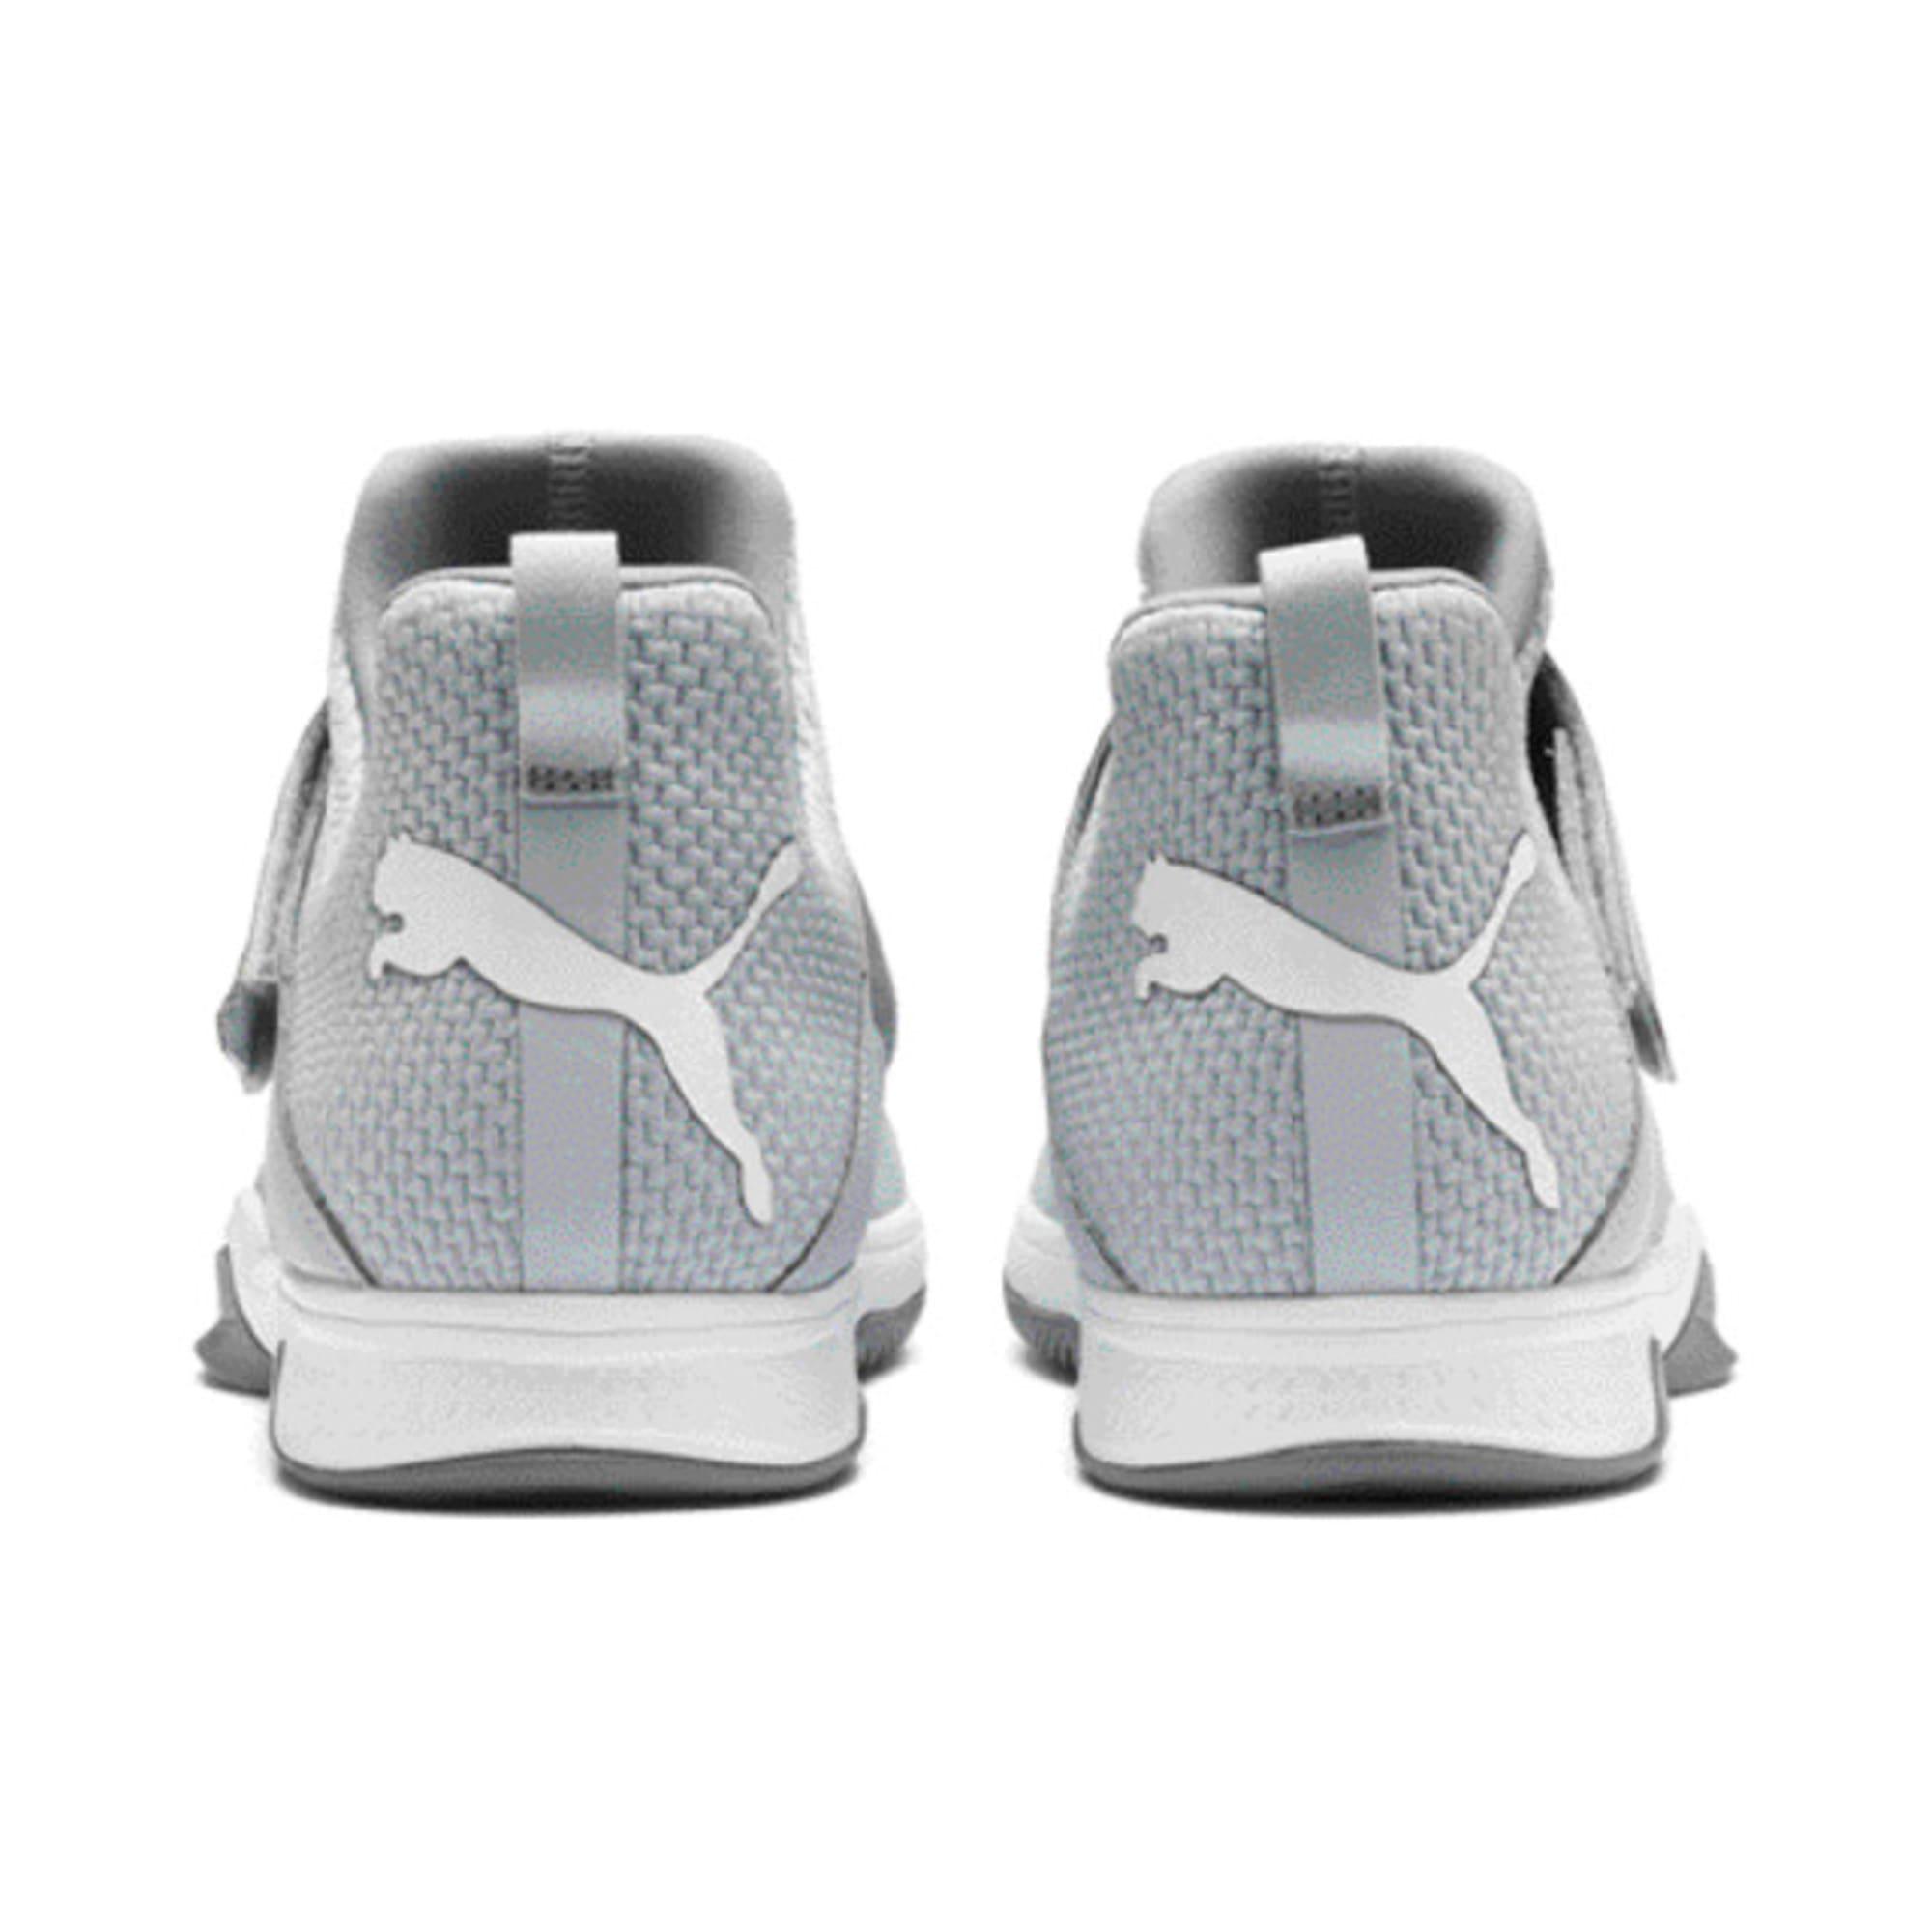 Thumbnail 6 of Rise XT3 Handball Shoes, Grey Dawn-White-Tradewinds, medium-IND